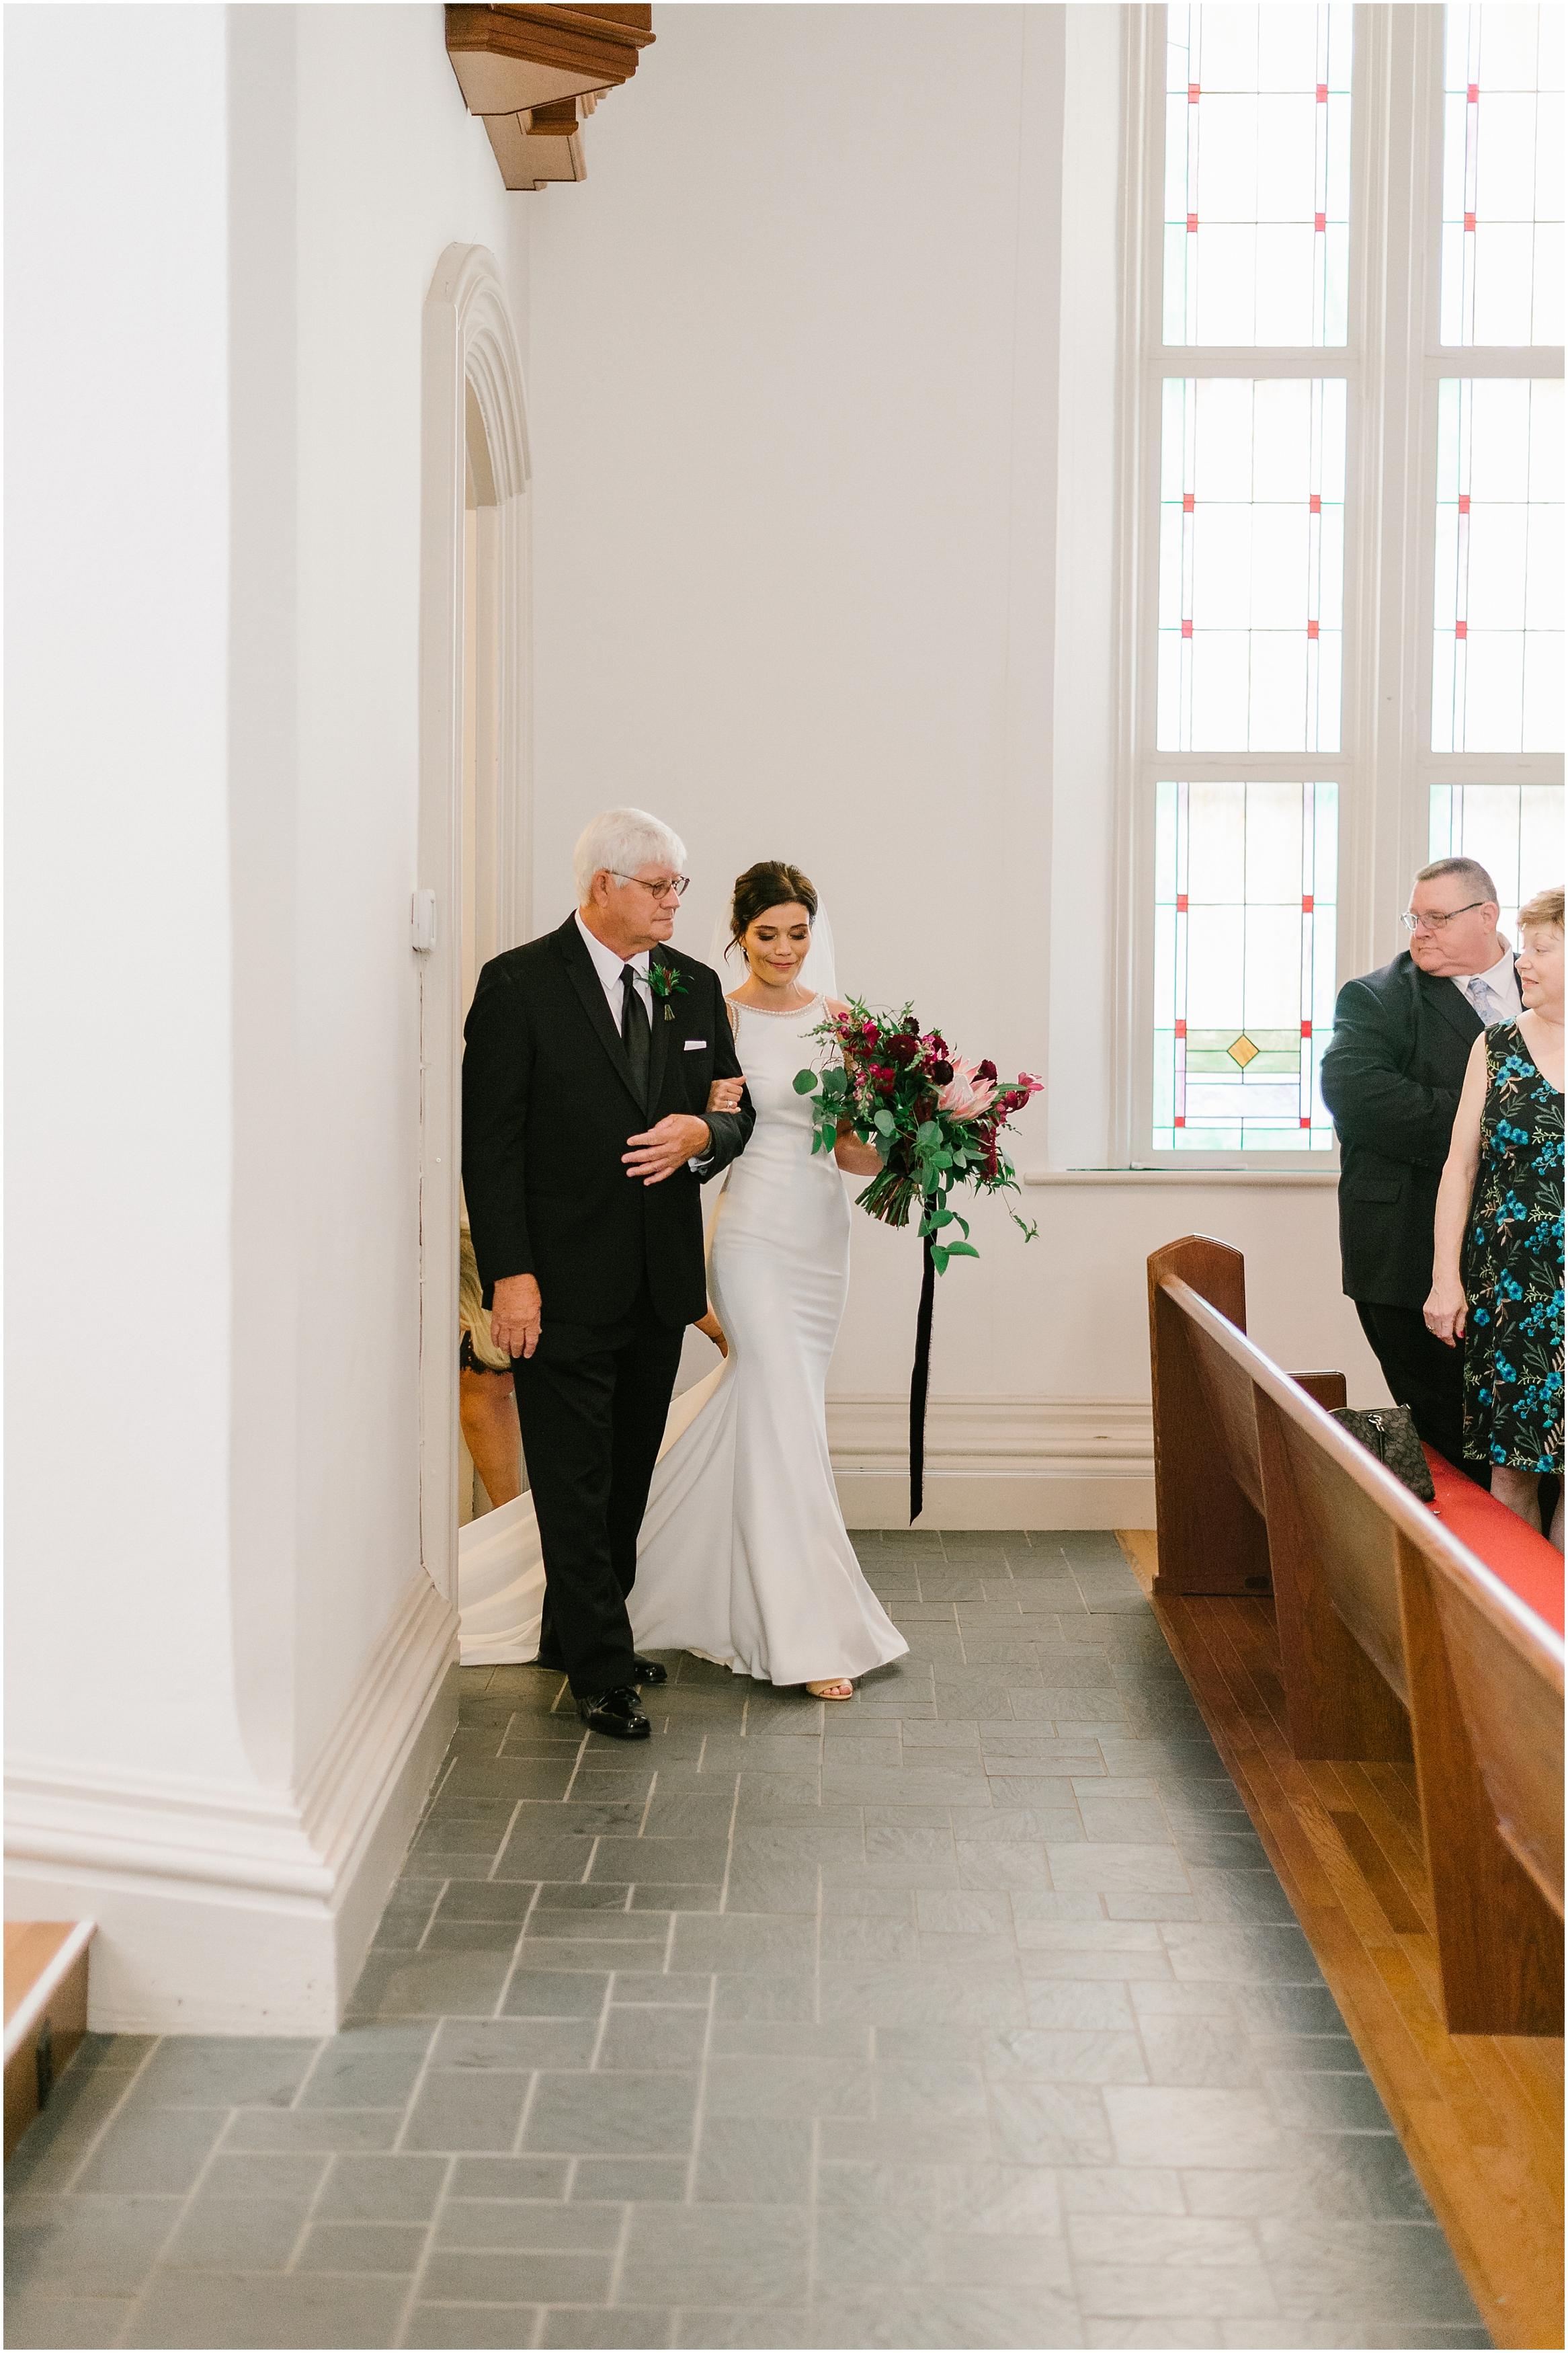 Rebecca_Shehorn_Photography_Indianapolis Wedding Photographer Sycamore at Mallow Run Wedding_9726.jpg